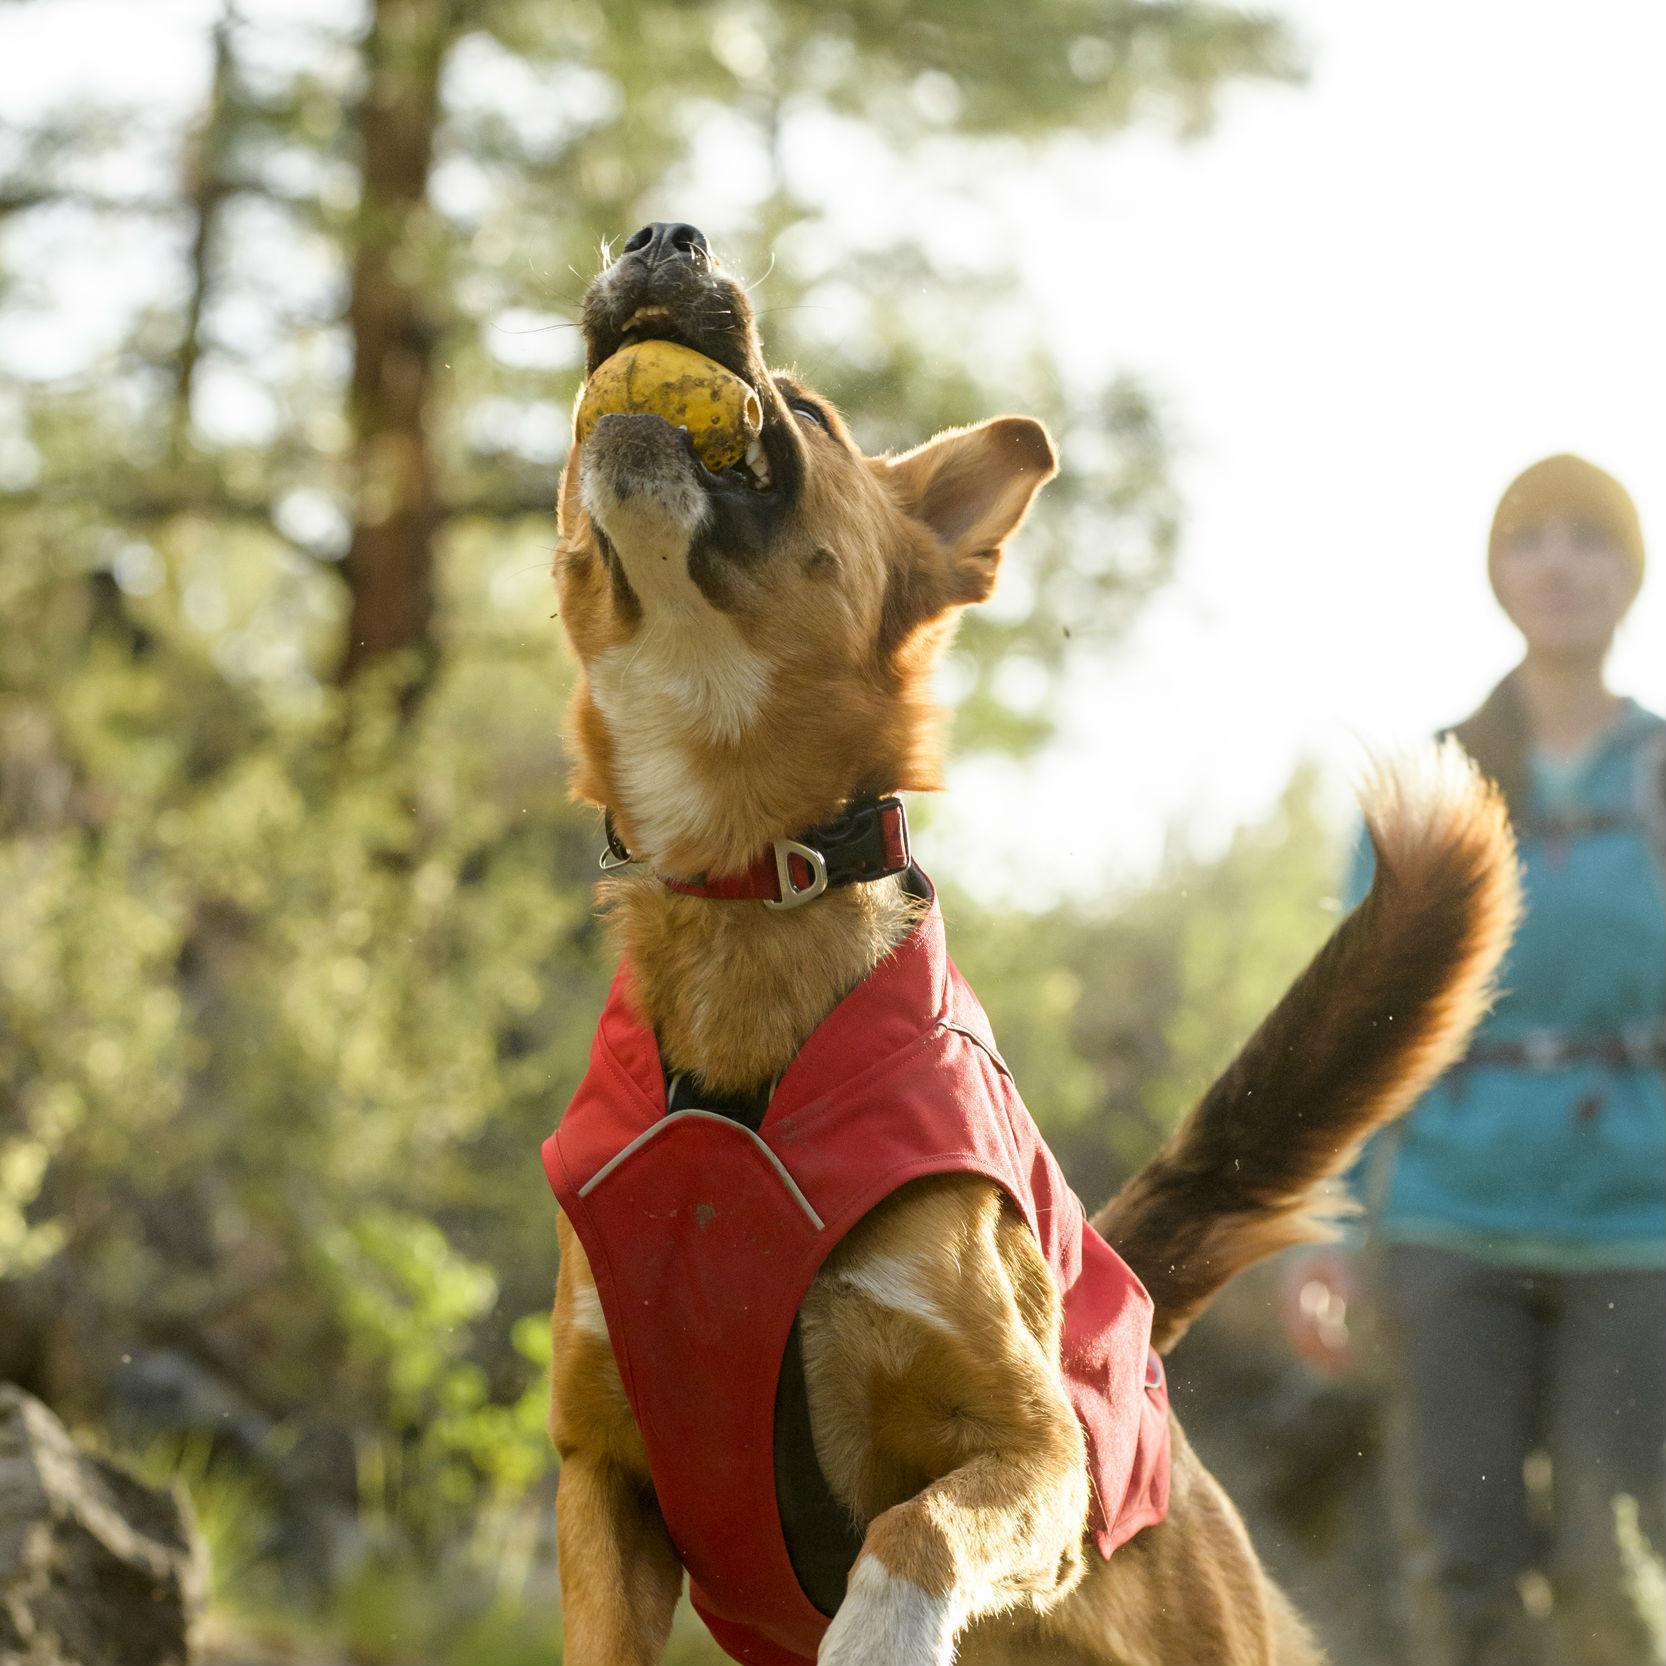 Turnup Dog Toy by RuffWear - Dandelion Yellow